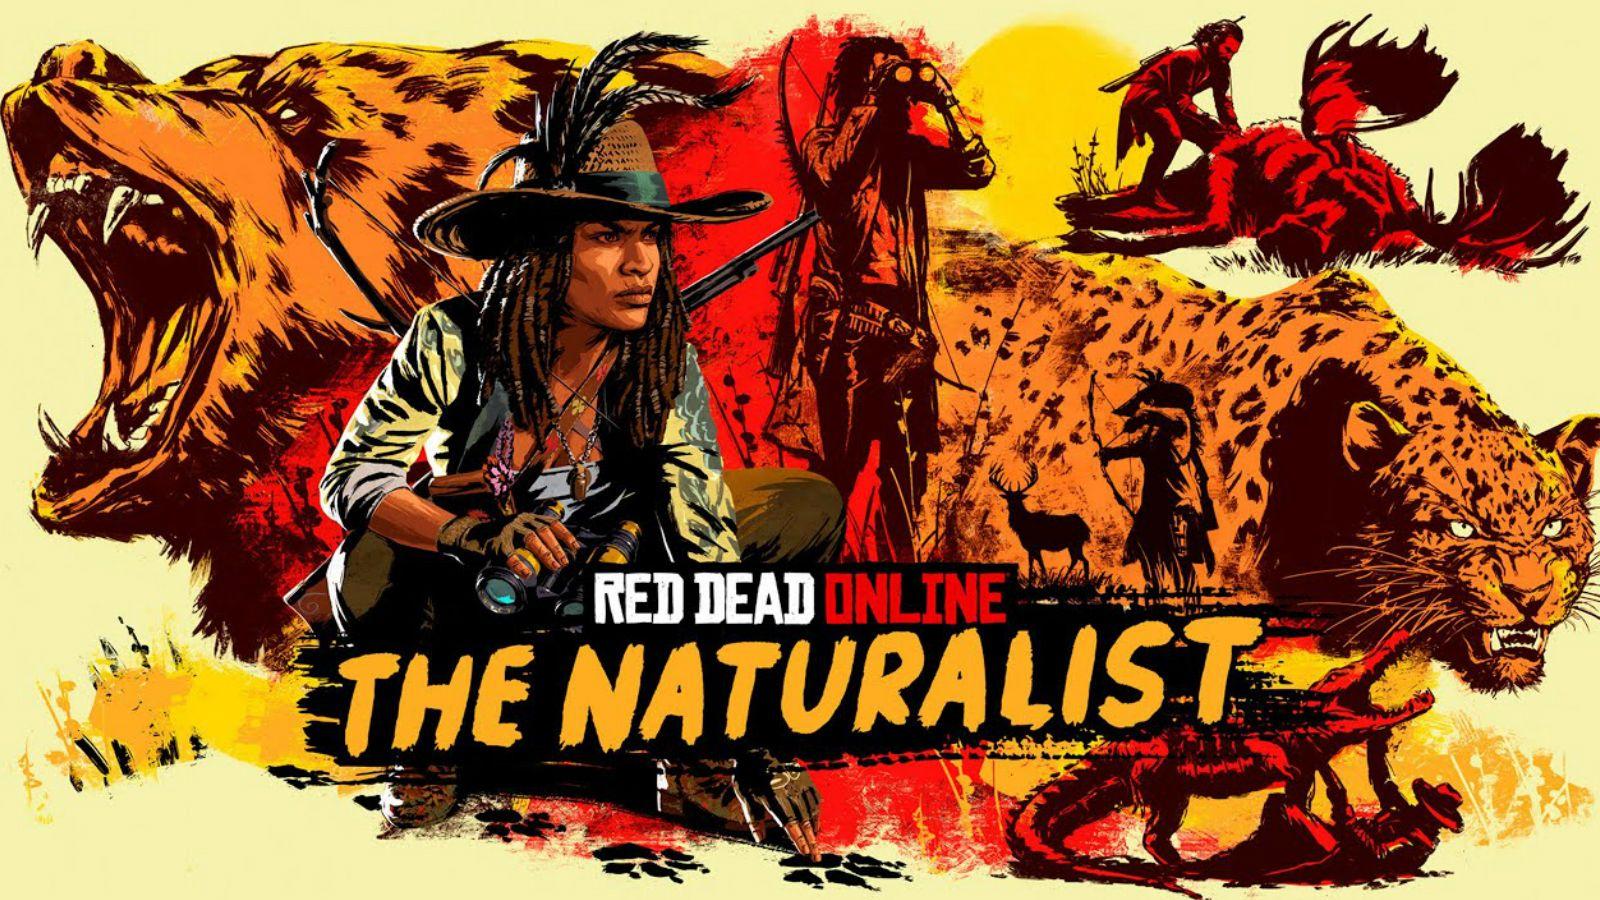 Red Dead Online Rockstar Games The Naturaliste